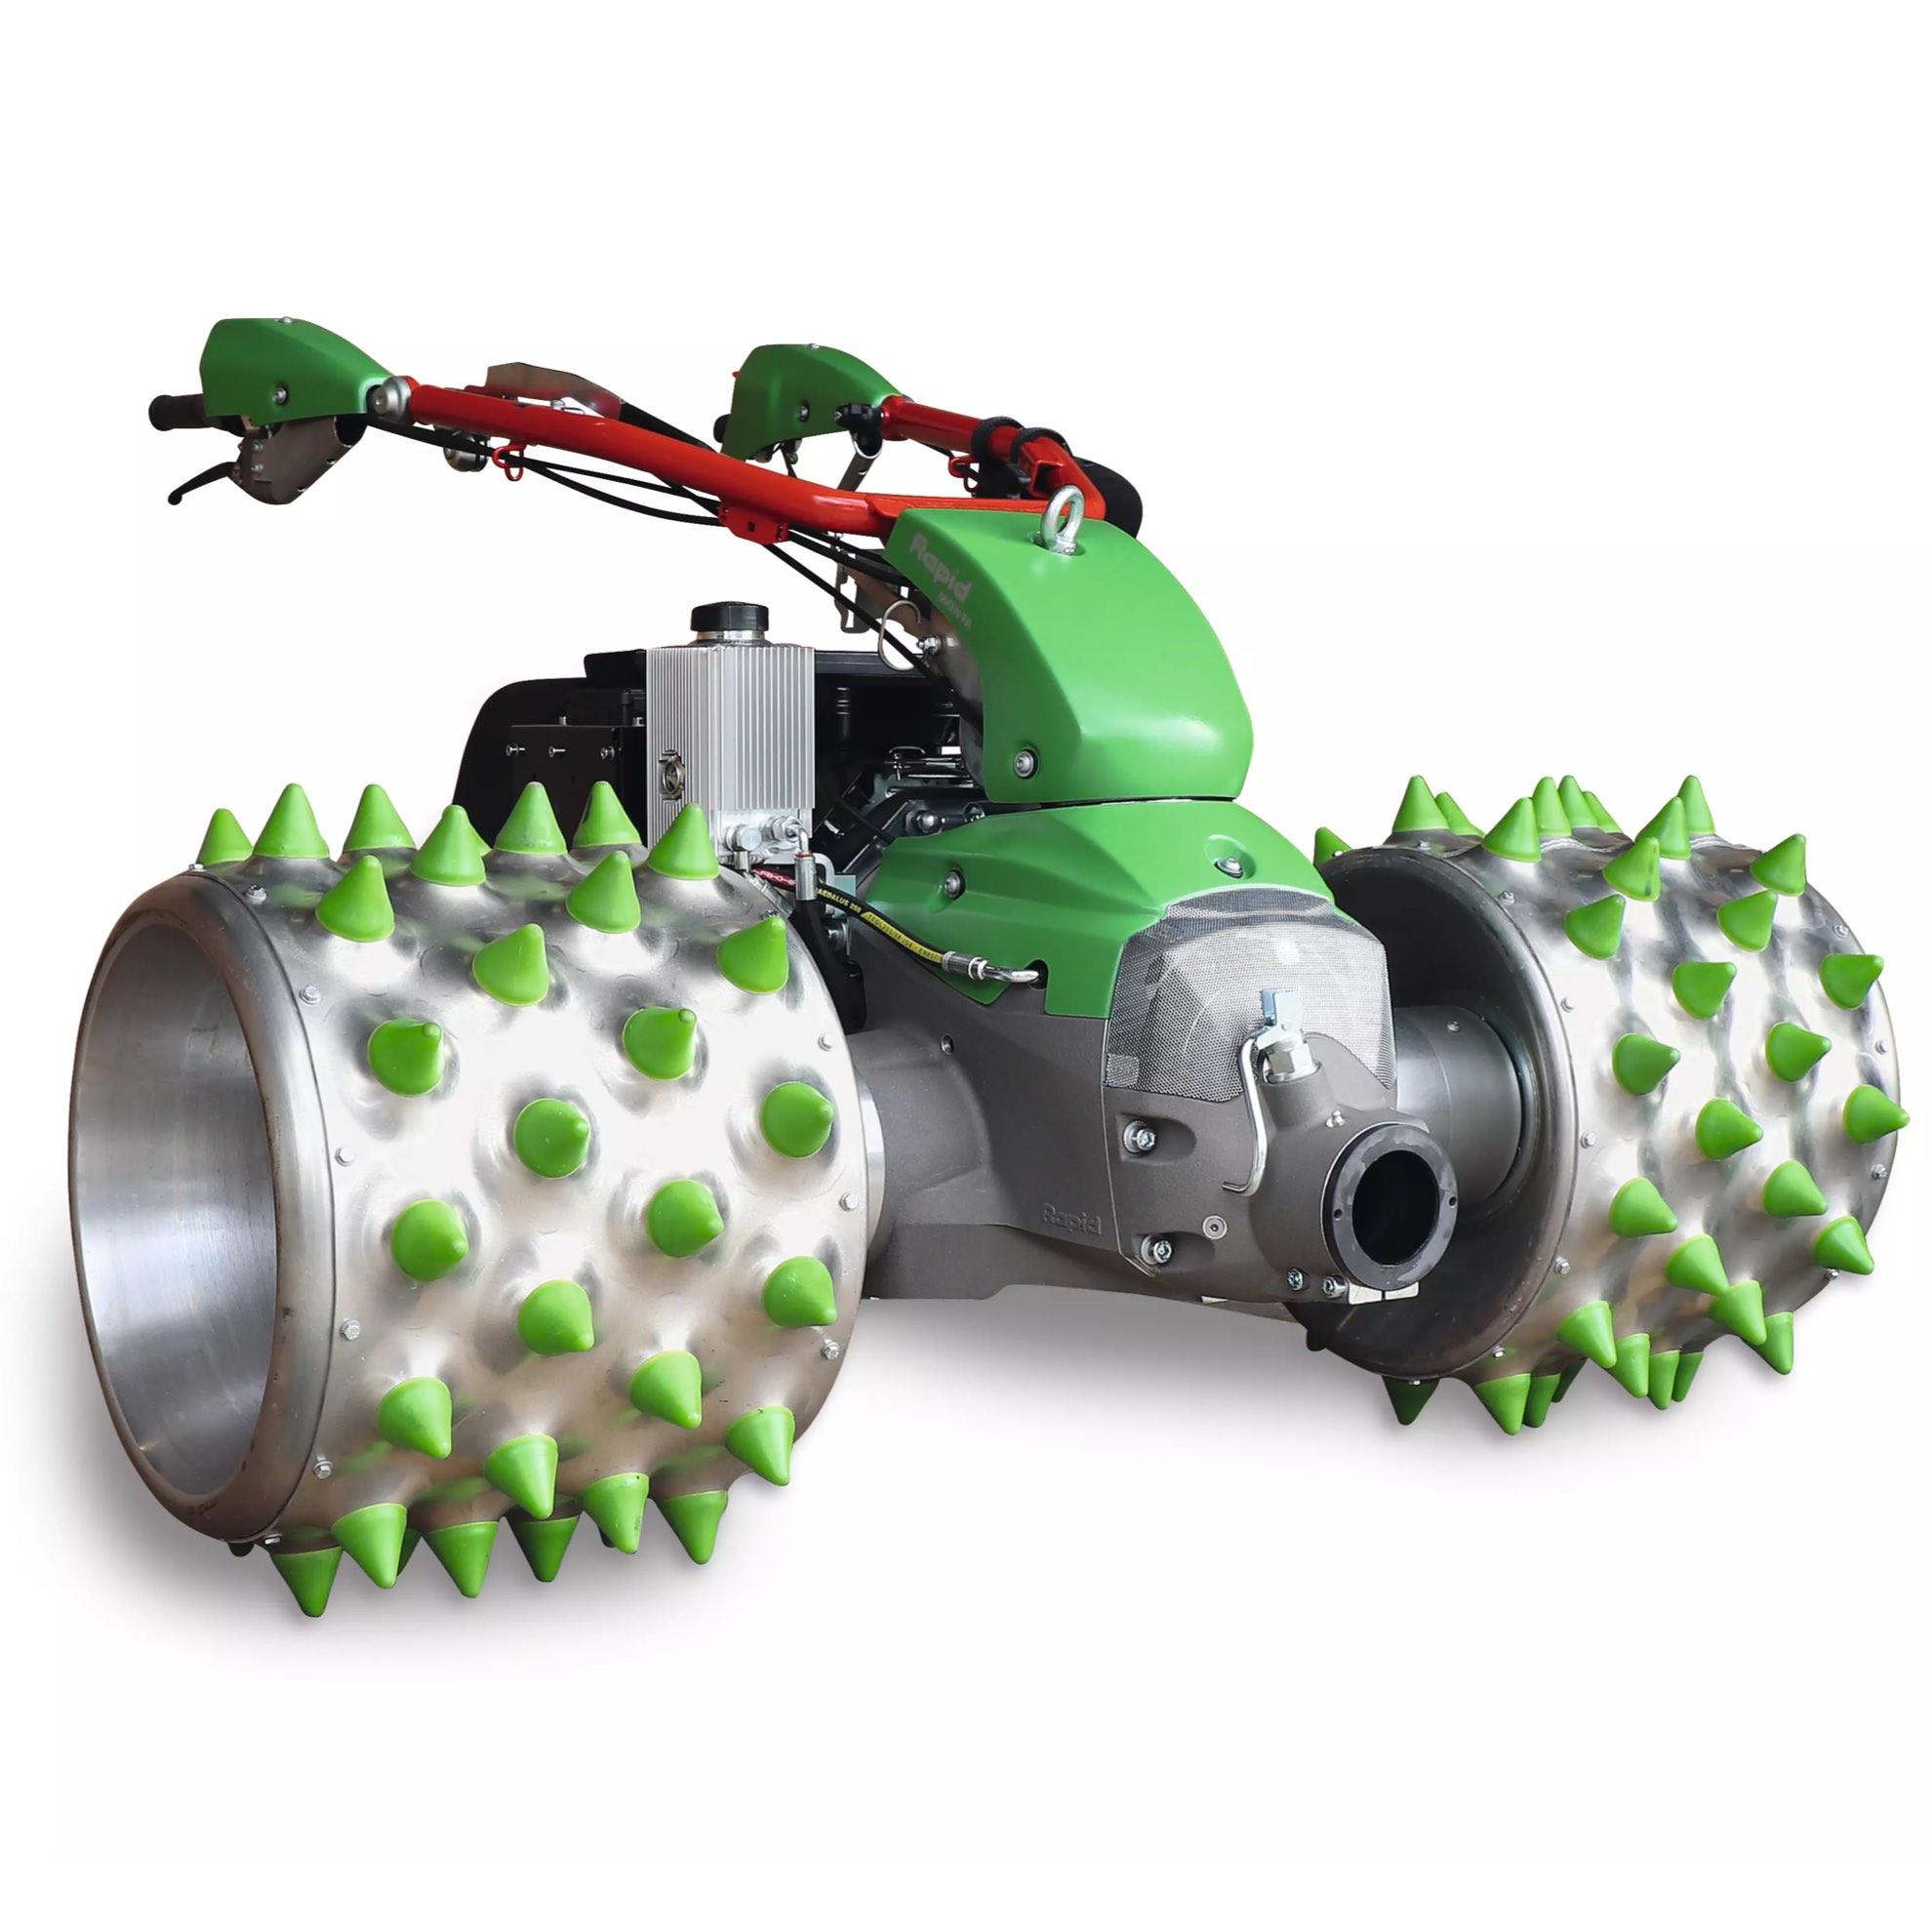 Rapid Monta Two-wheel Tractor